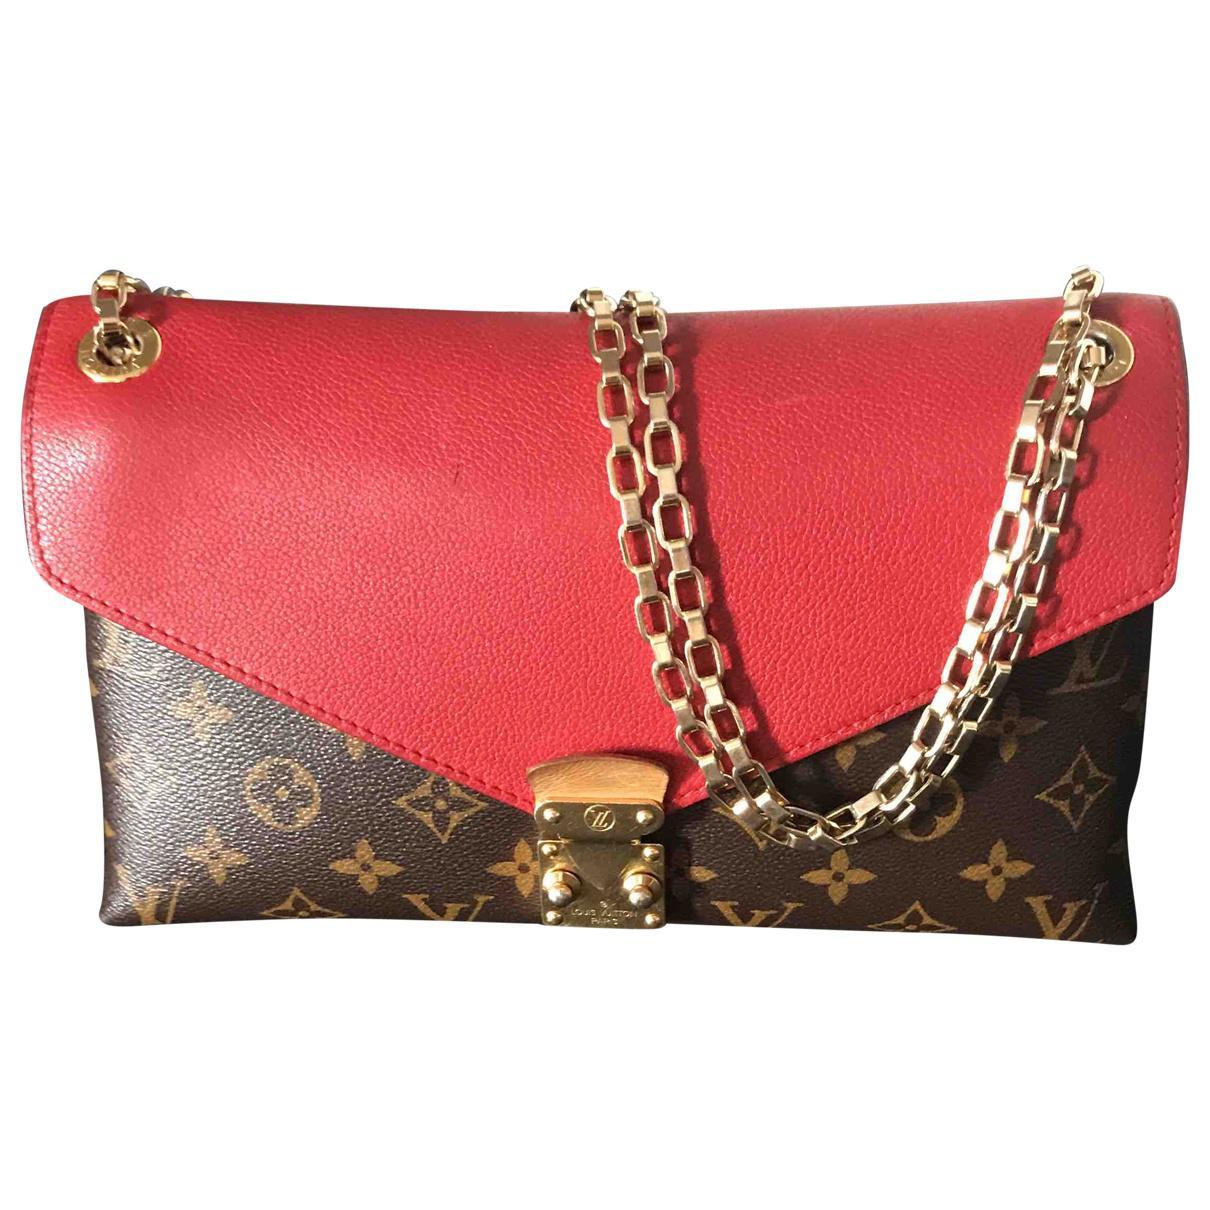 Louis Vuitton Pallas Red Cloth Handbag in Red - Save 29% - Lyst 25b178ebeb740